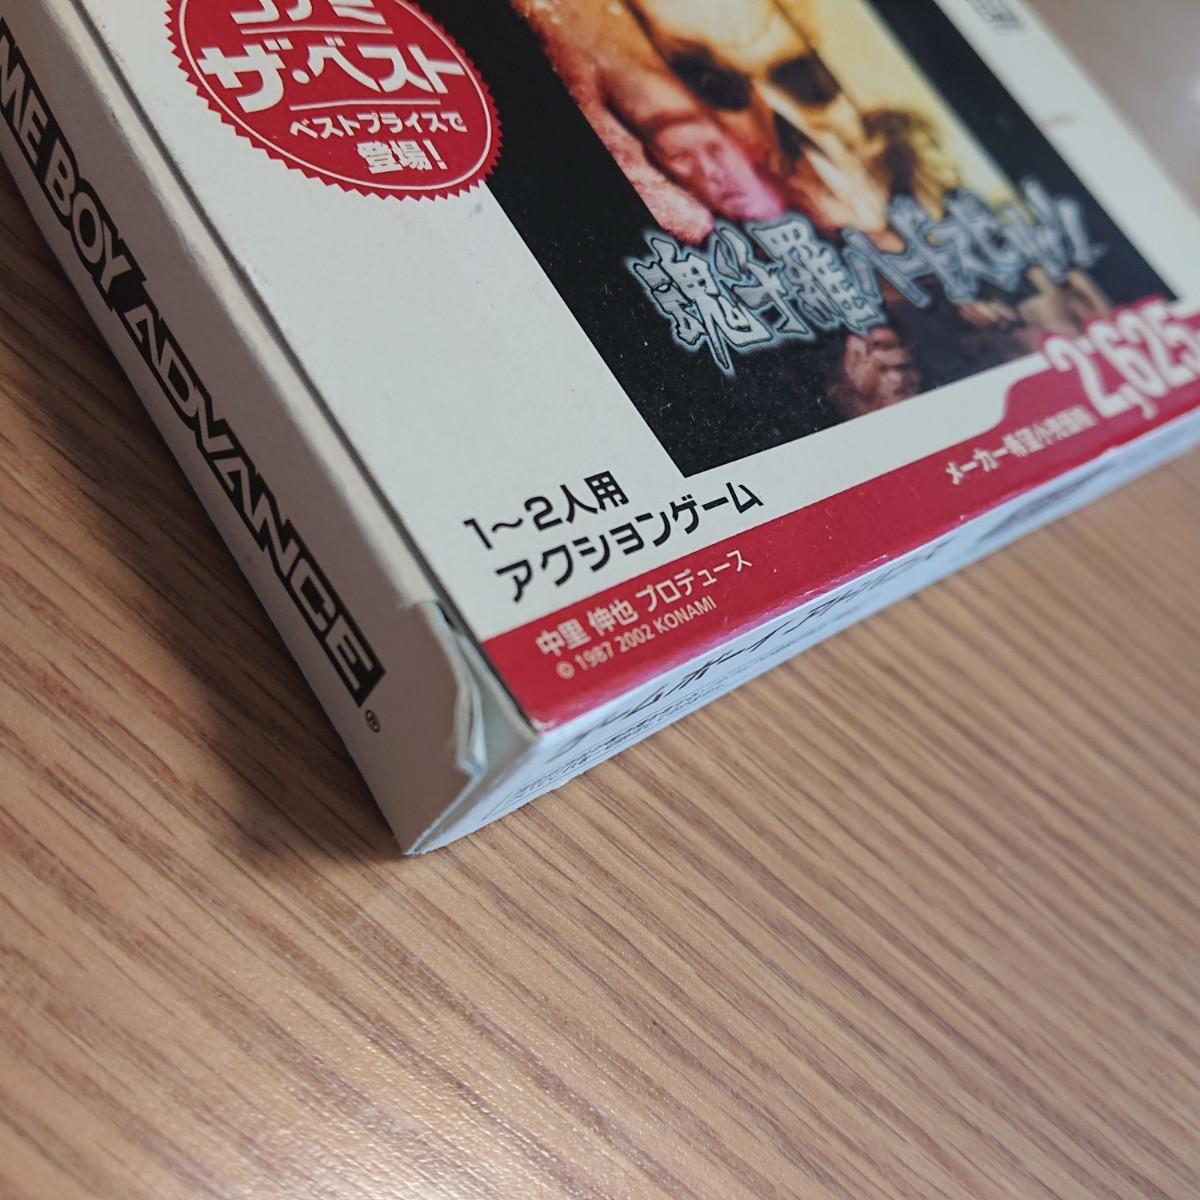 【GBA】 魂斗羅 ハードスピリッツ 【コナミザベスト】中古ソフト